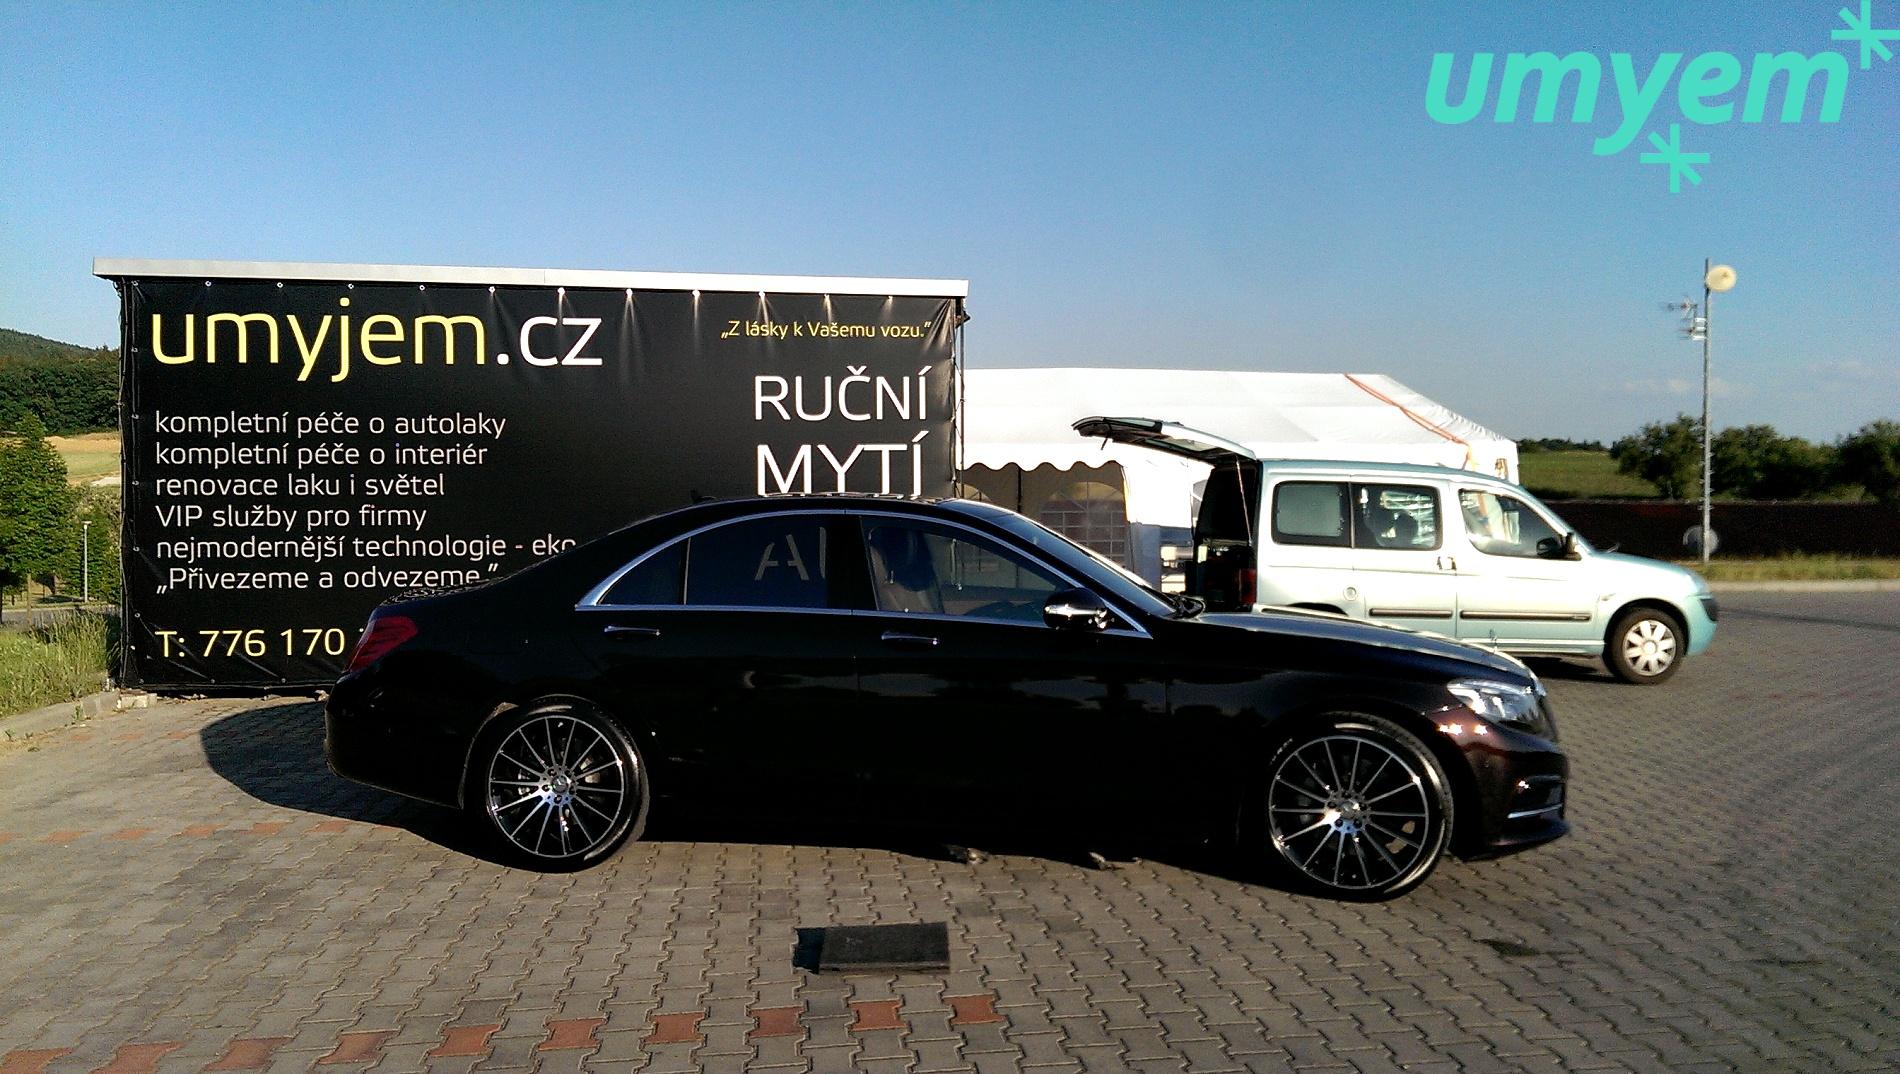 Mercedes Benz S - osetreni tuhym voskem_5.jpg